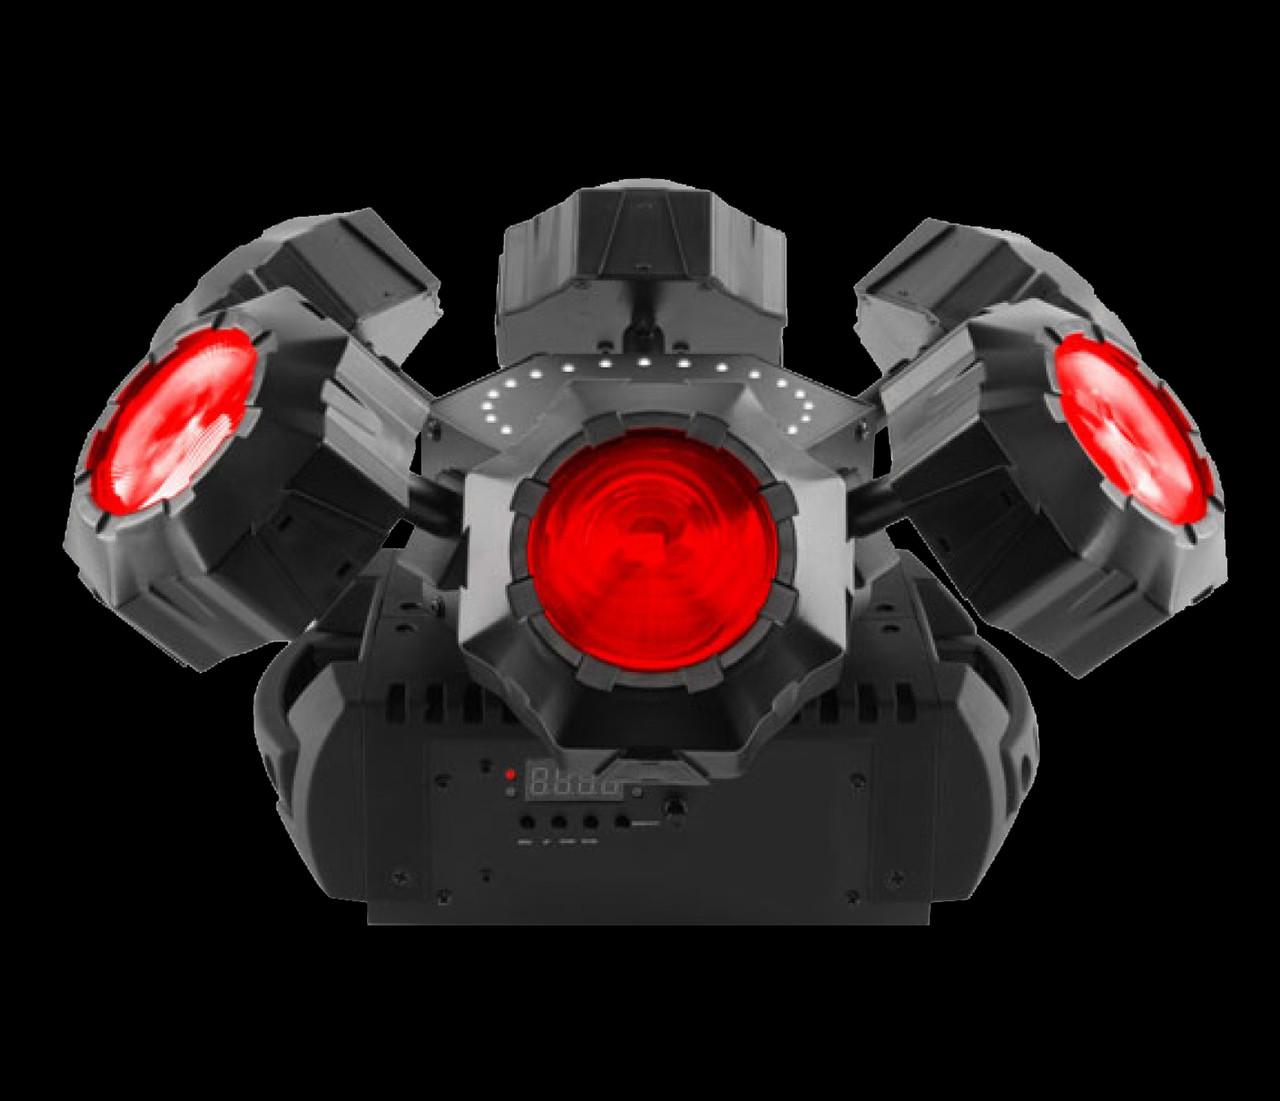 Chauvet DJ Helicopter Q6 Multi-effect DJ Light w/ Laser